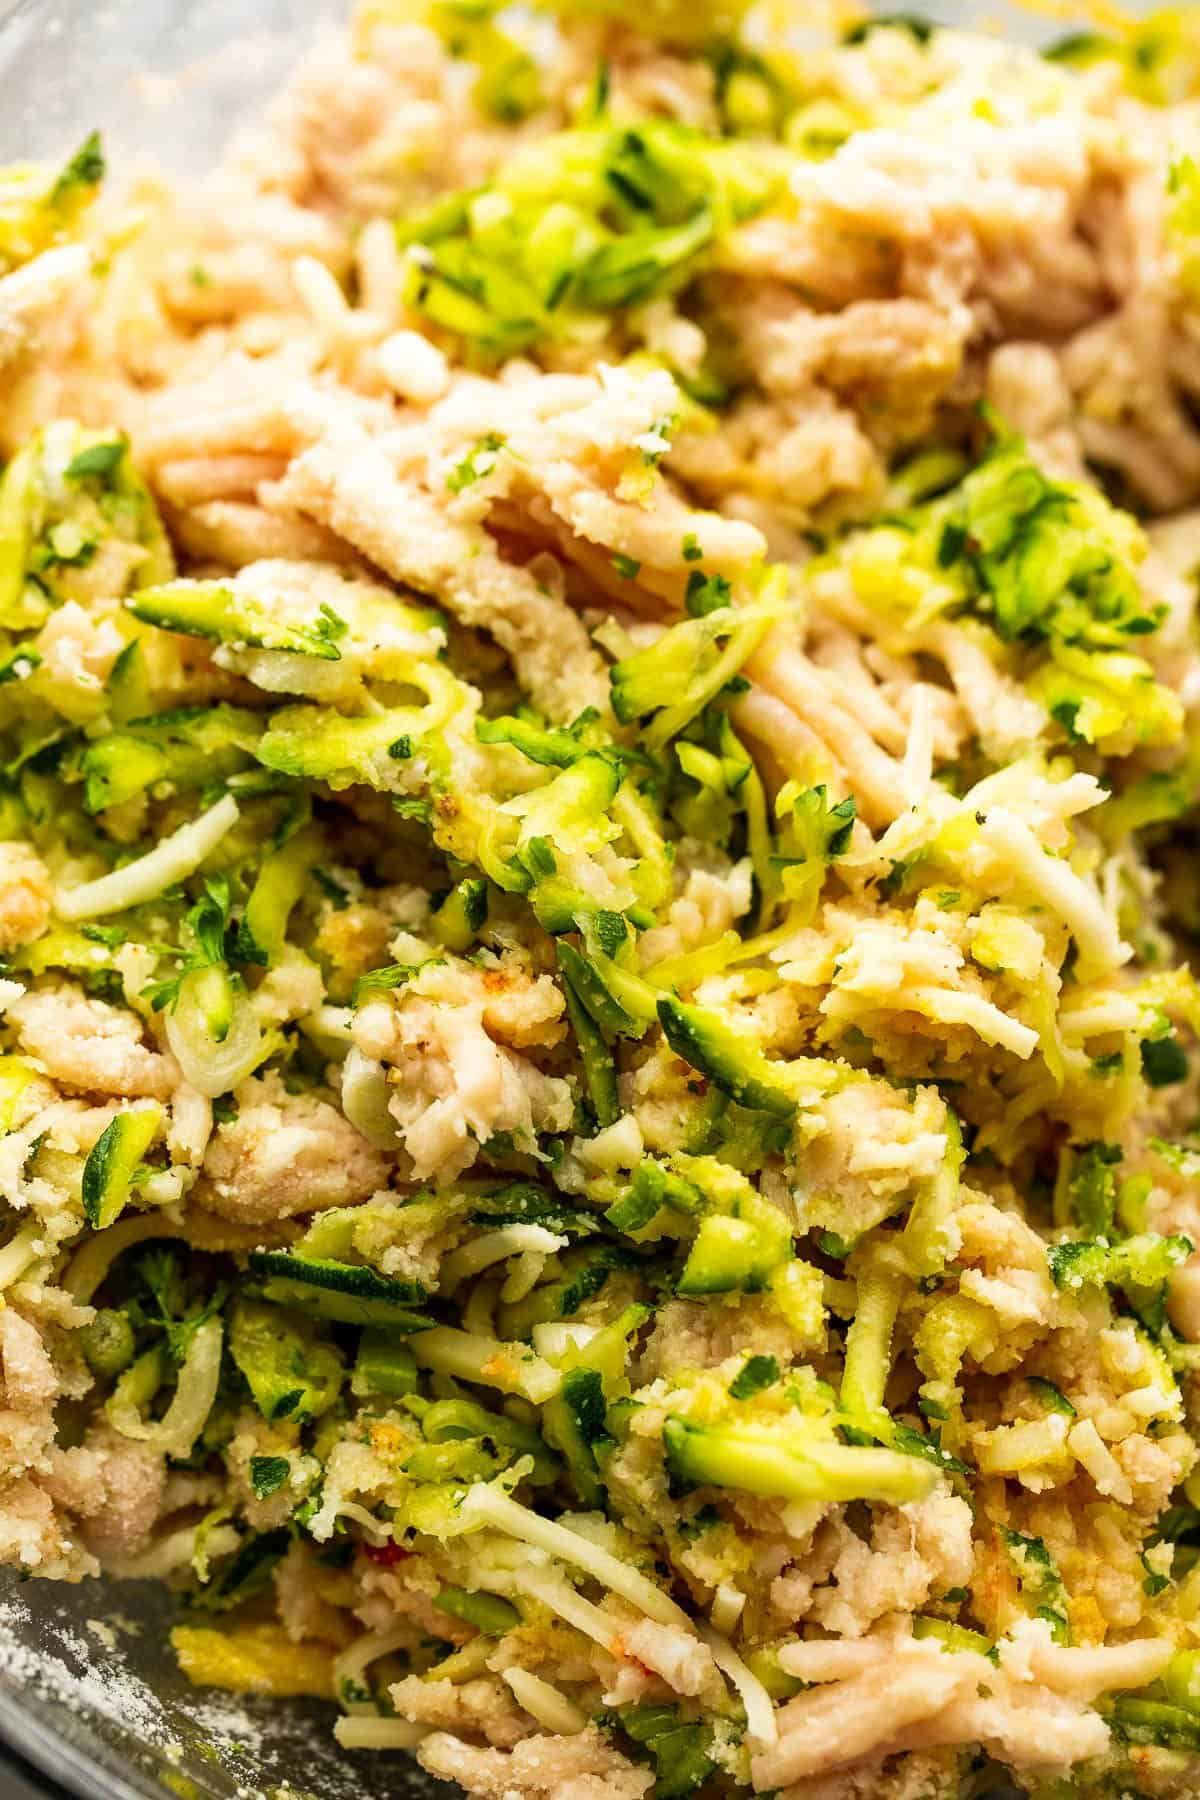 mixture of raw ground chicken and shredded zucchini